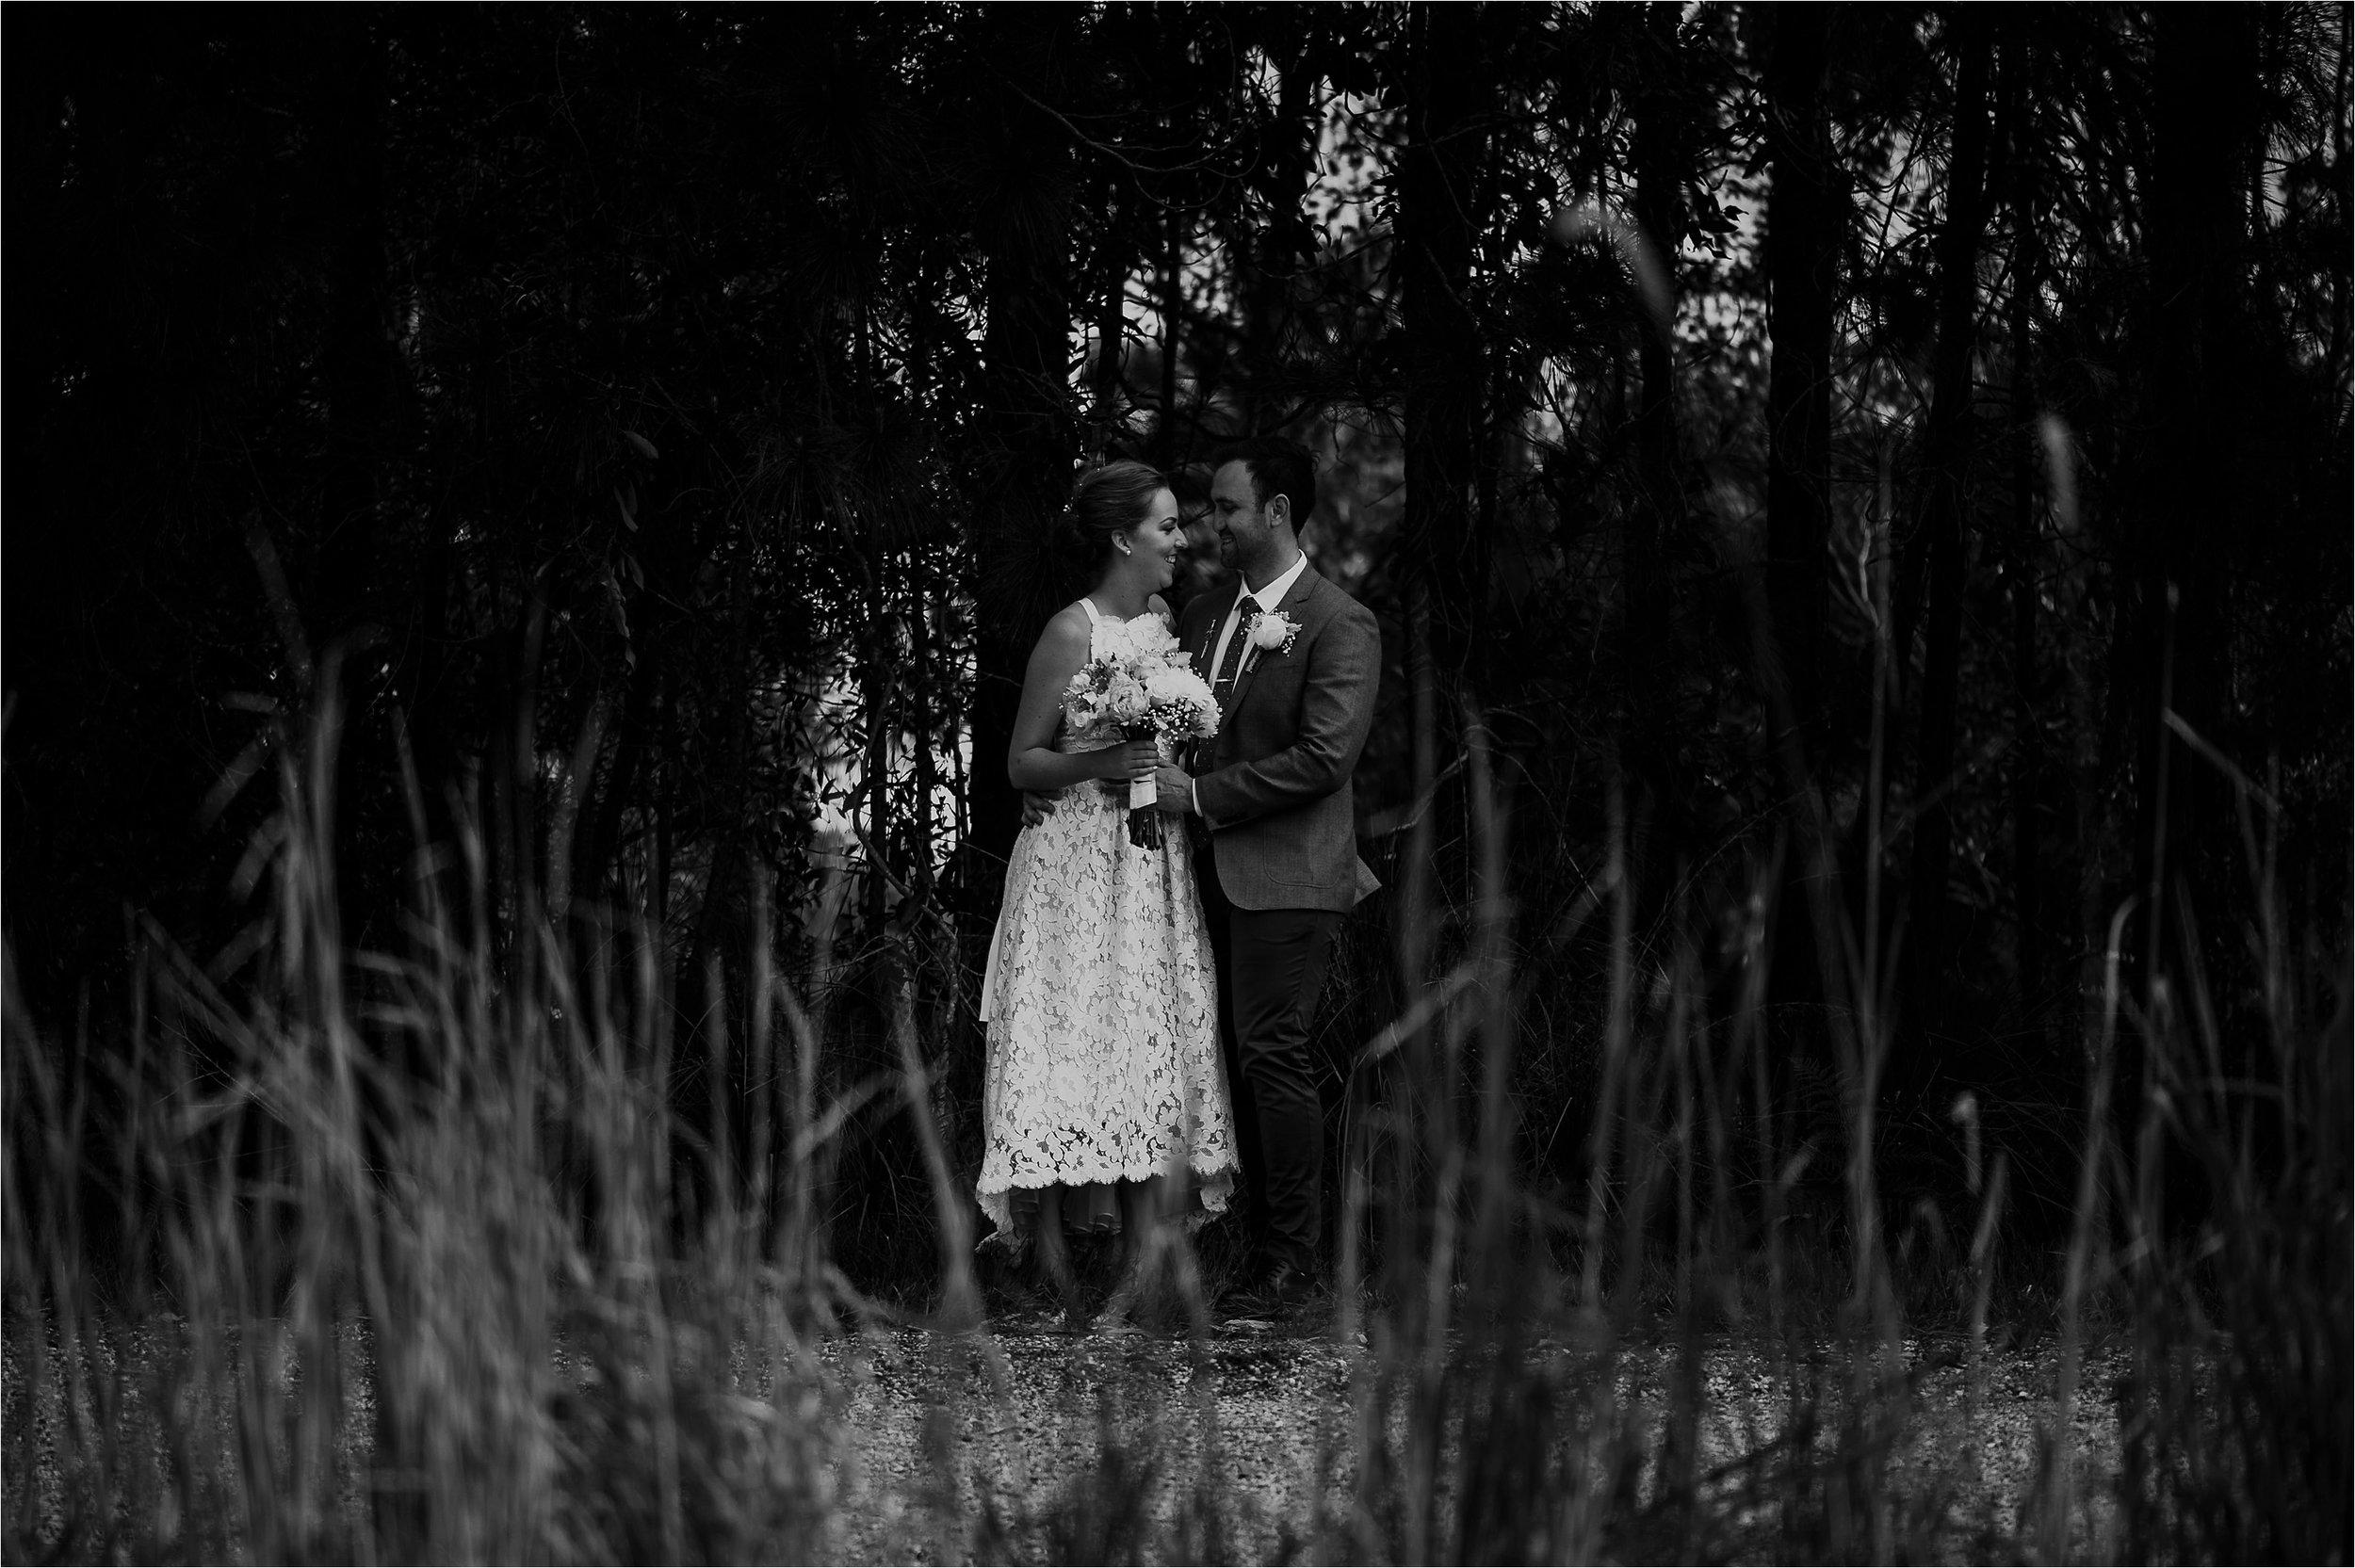 Osteria-Wedding-Bride-and-Groom_0026.jpg